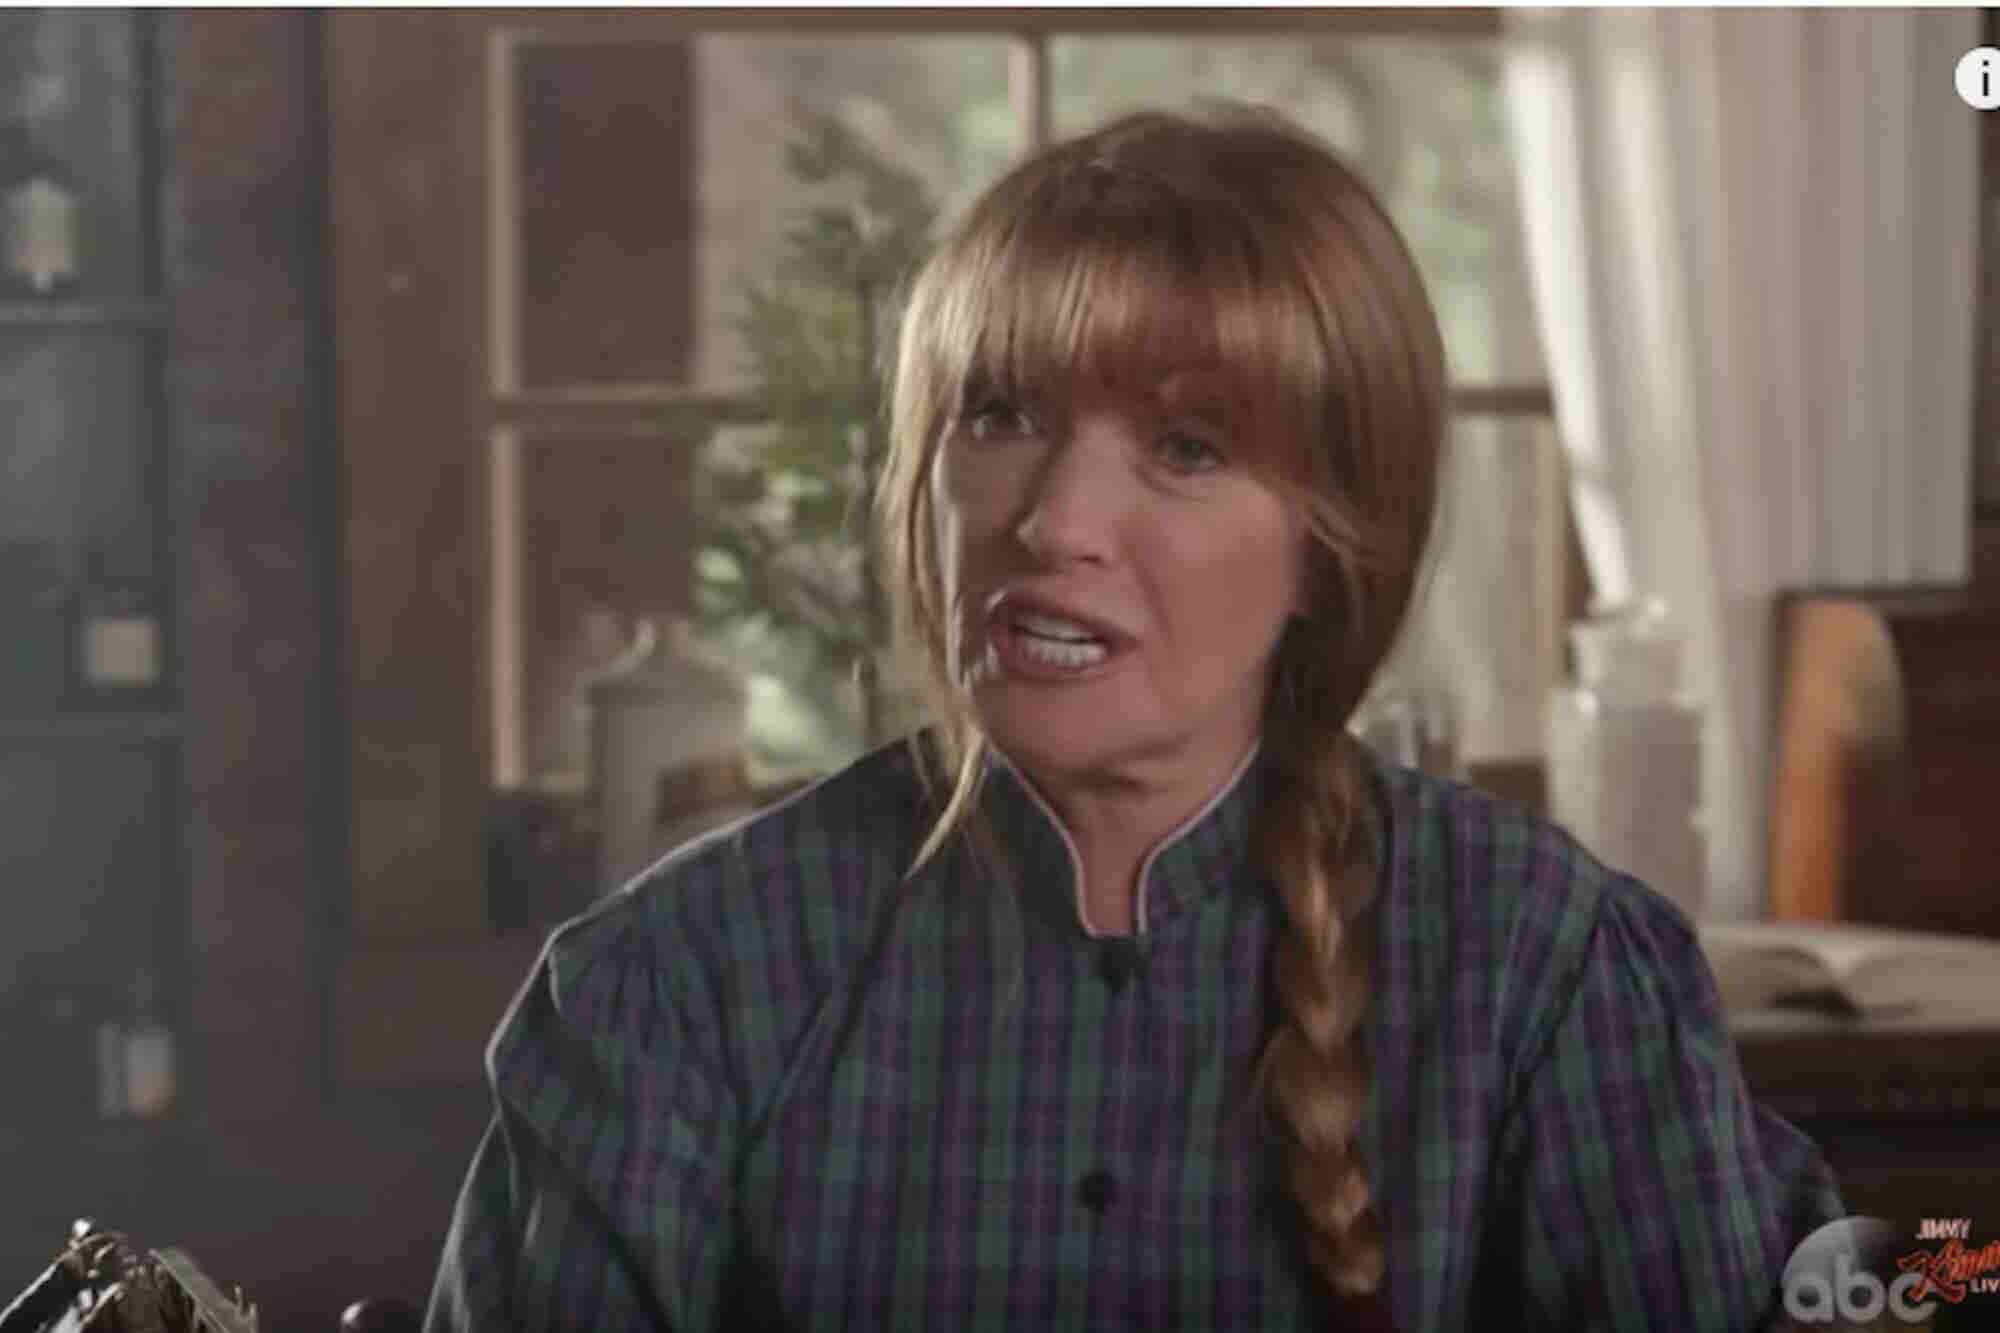 Jimmy Kimmel's 'Dr. Quinn Medicinal Marijuana Woman' Spoof Is Hilarious